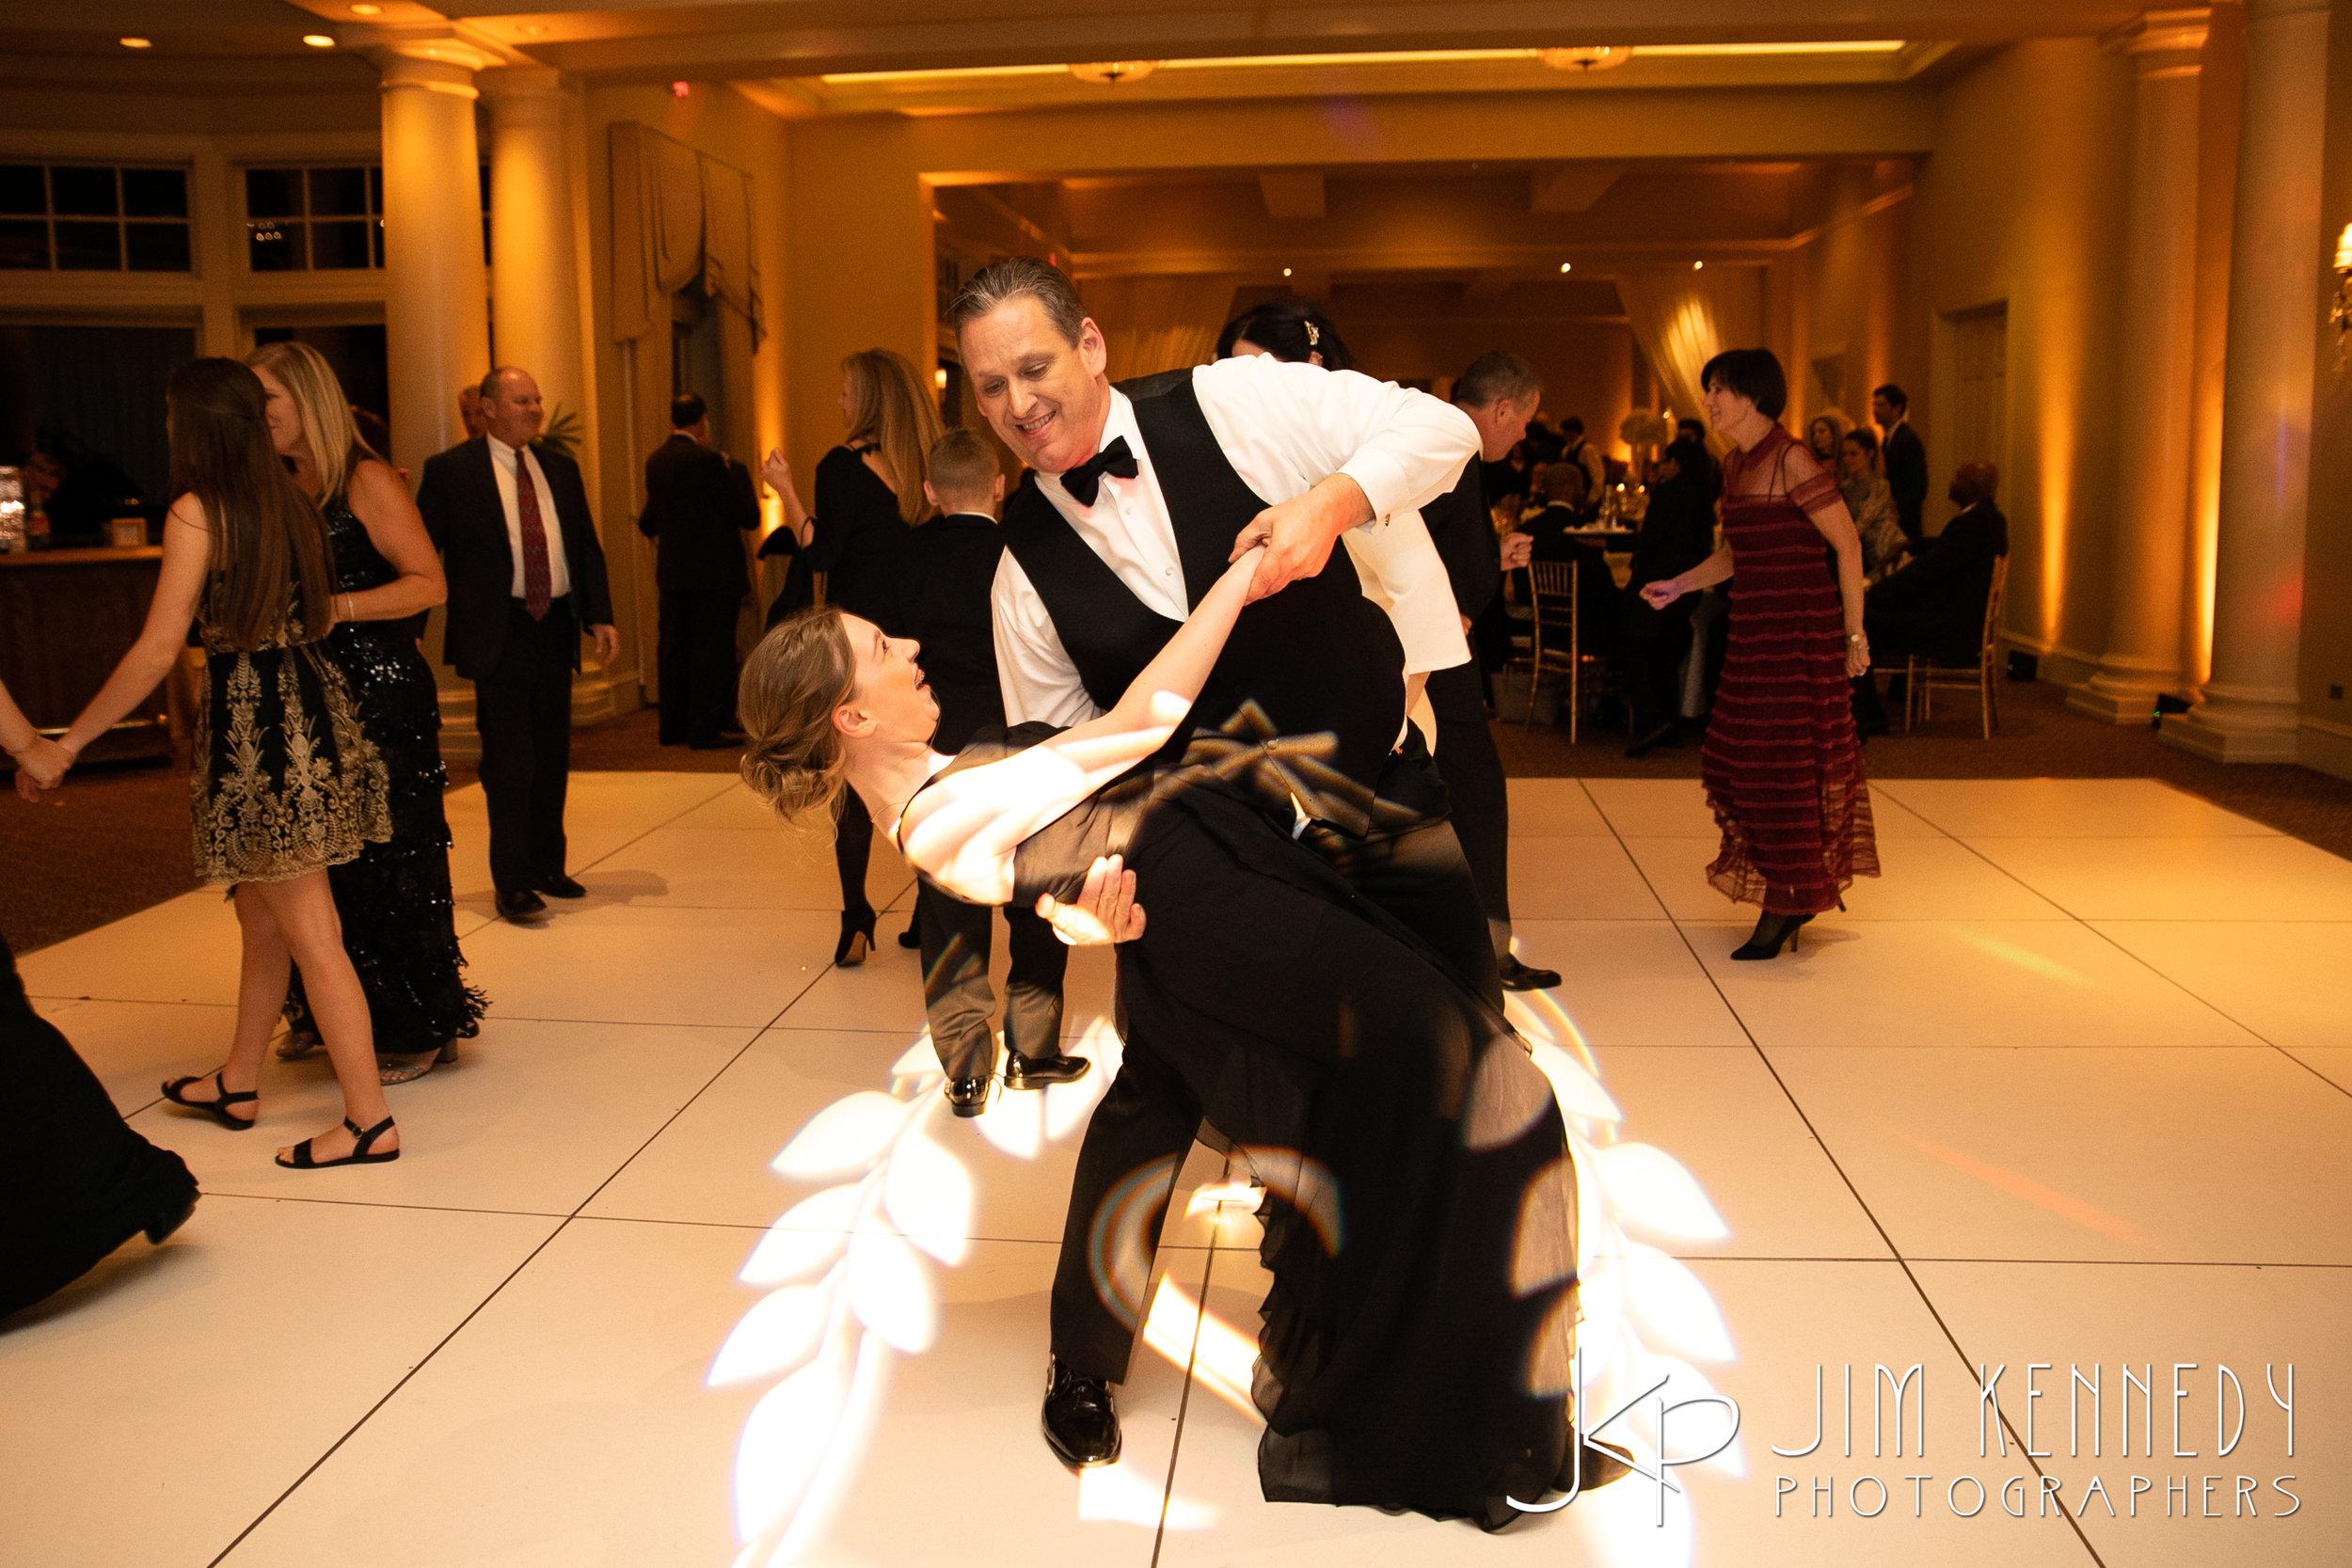 sherwood_country_club_wedding-3661.jpg